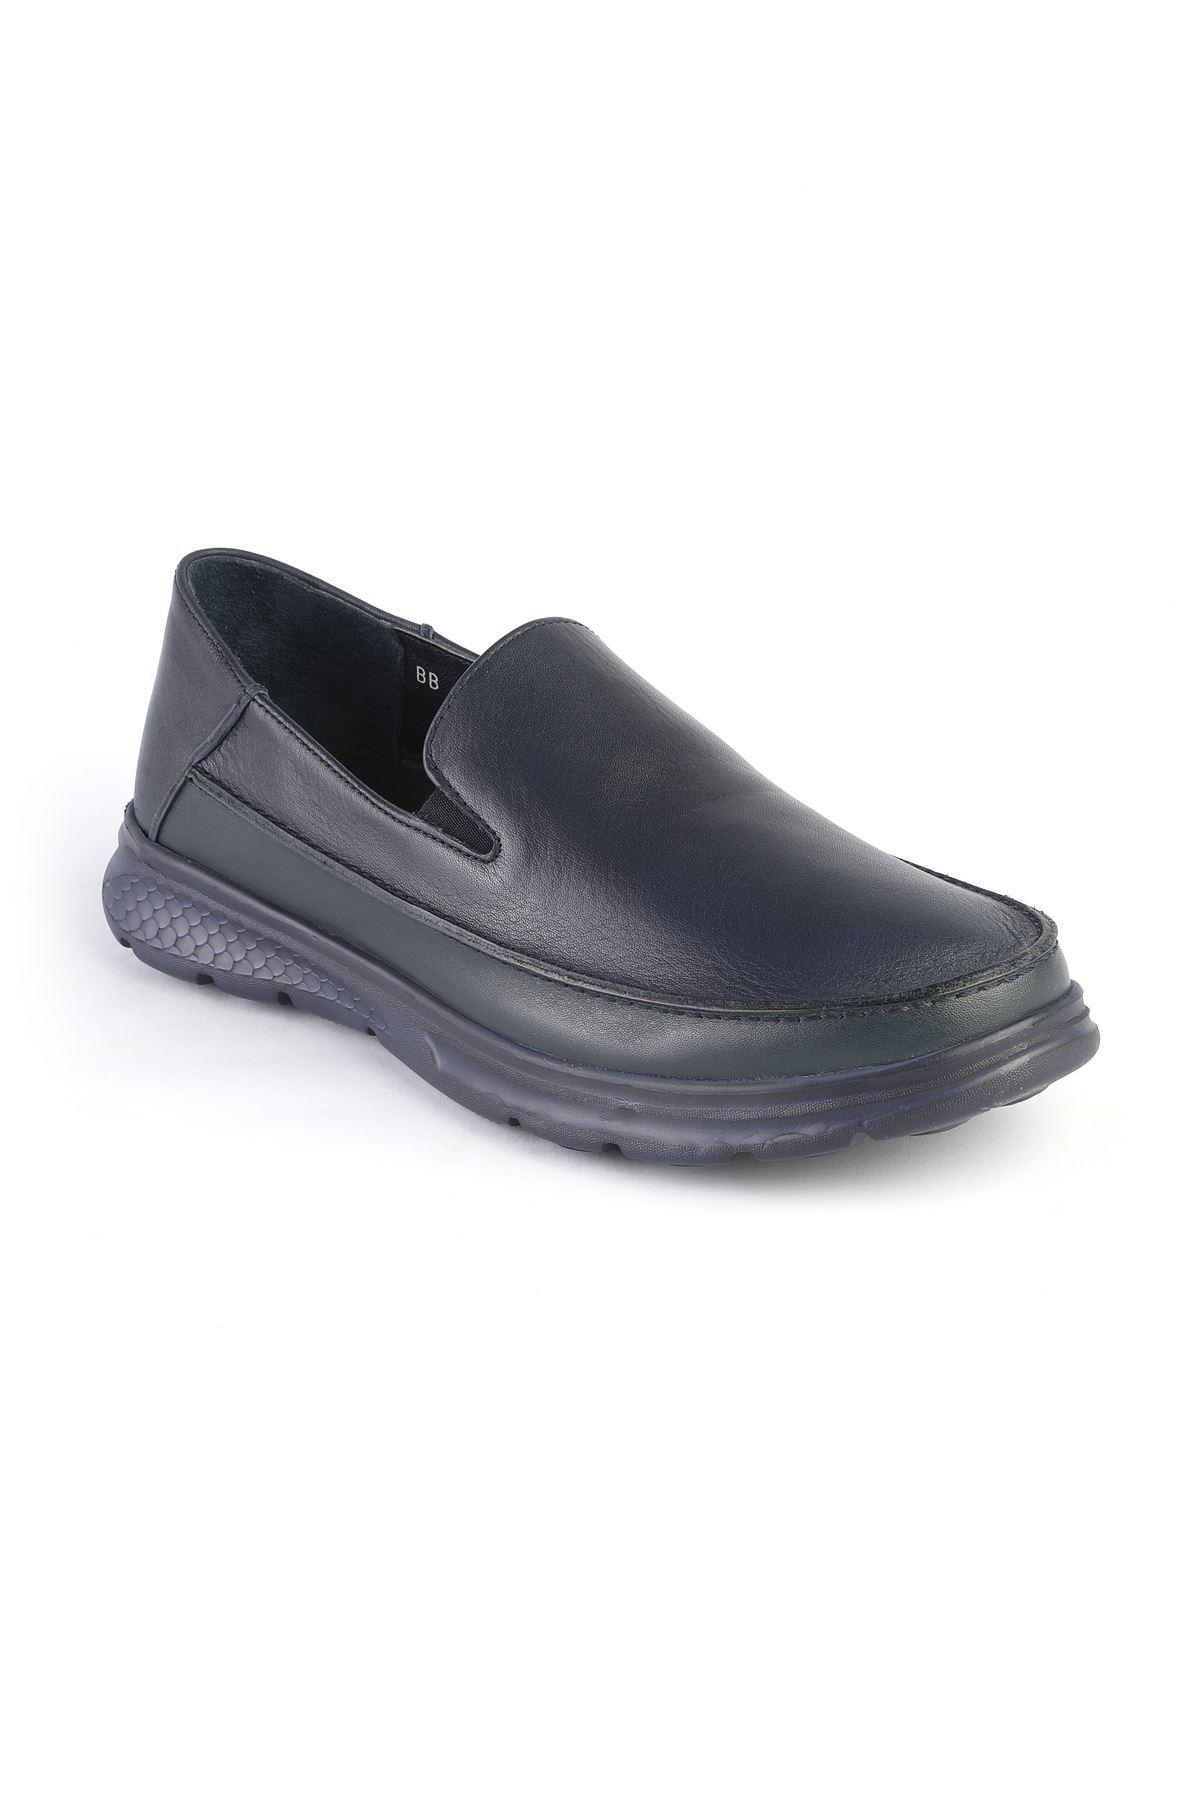 Libero 3223 Navy Blue Loafers